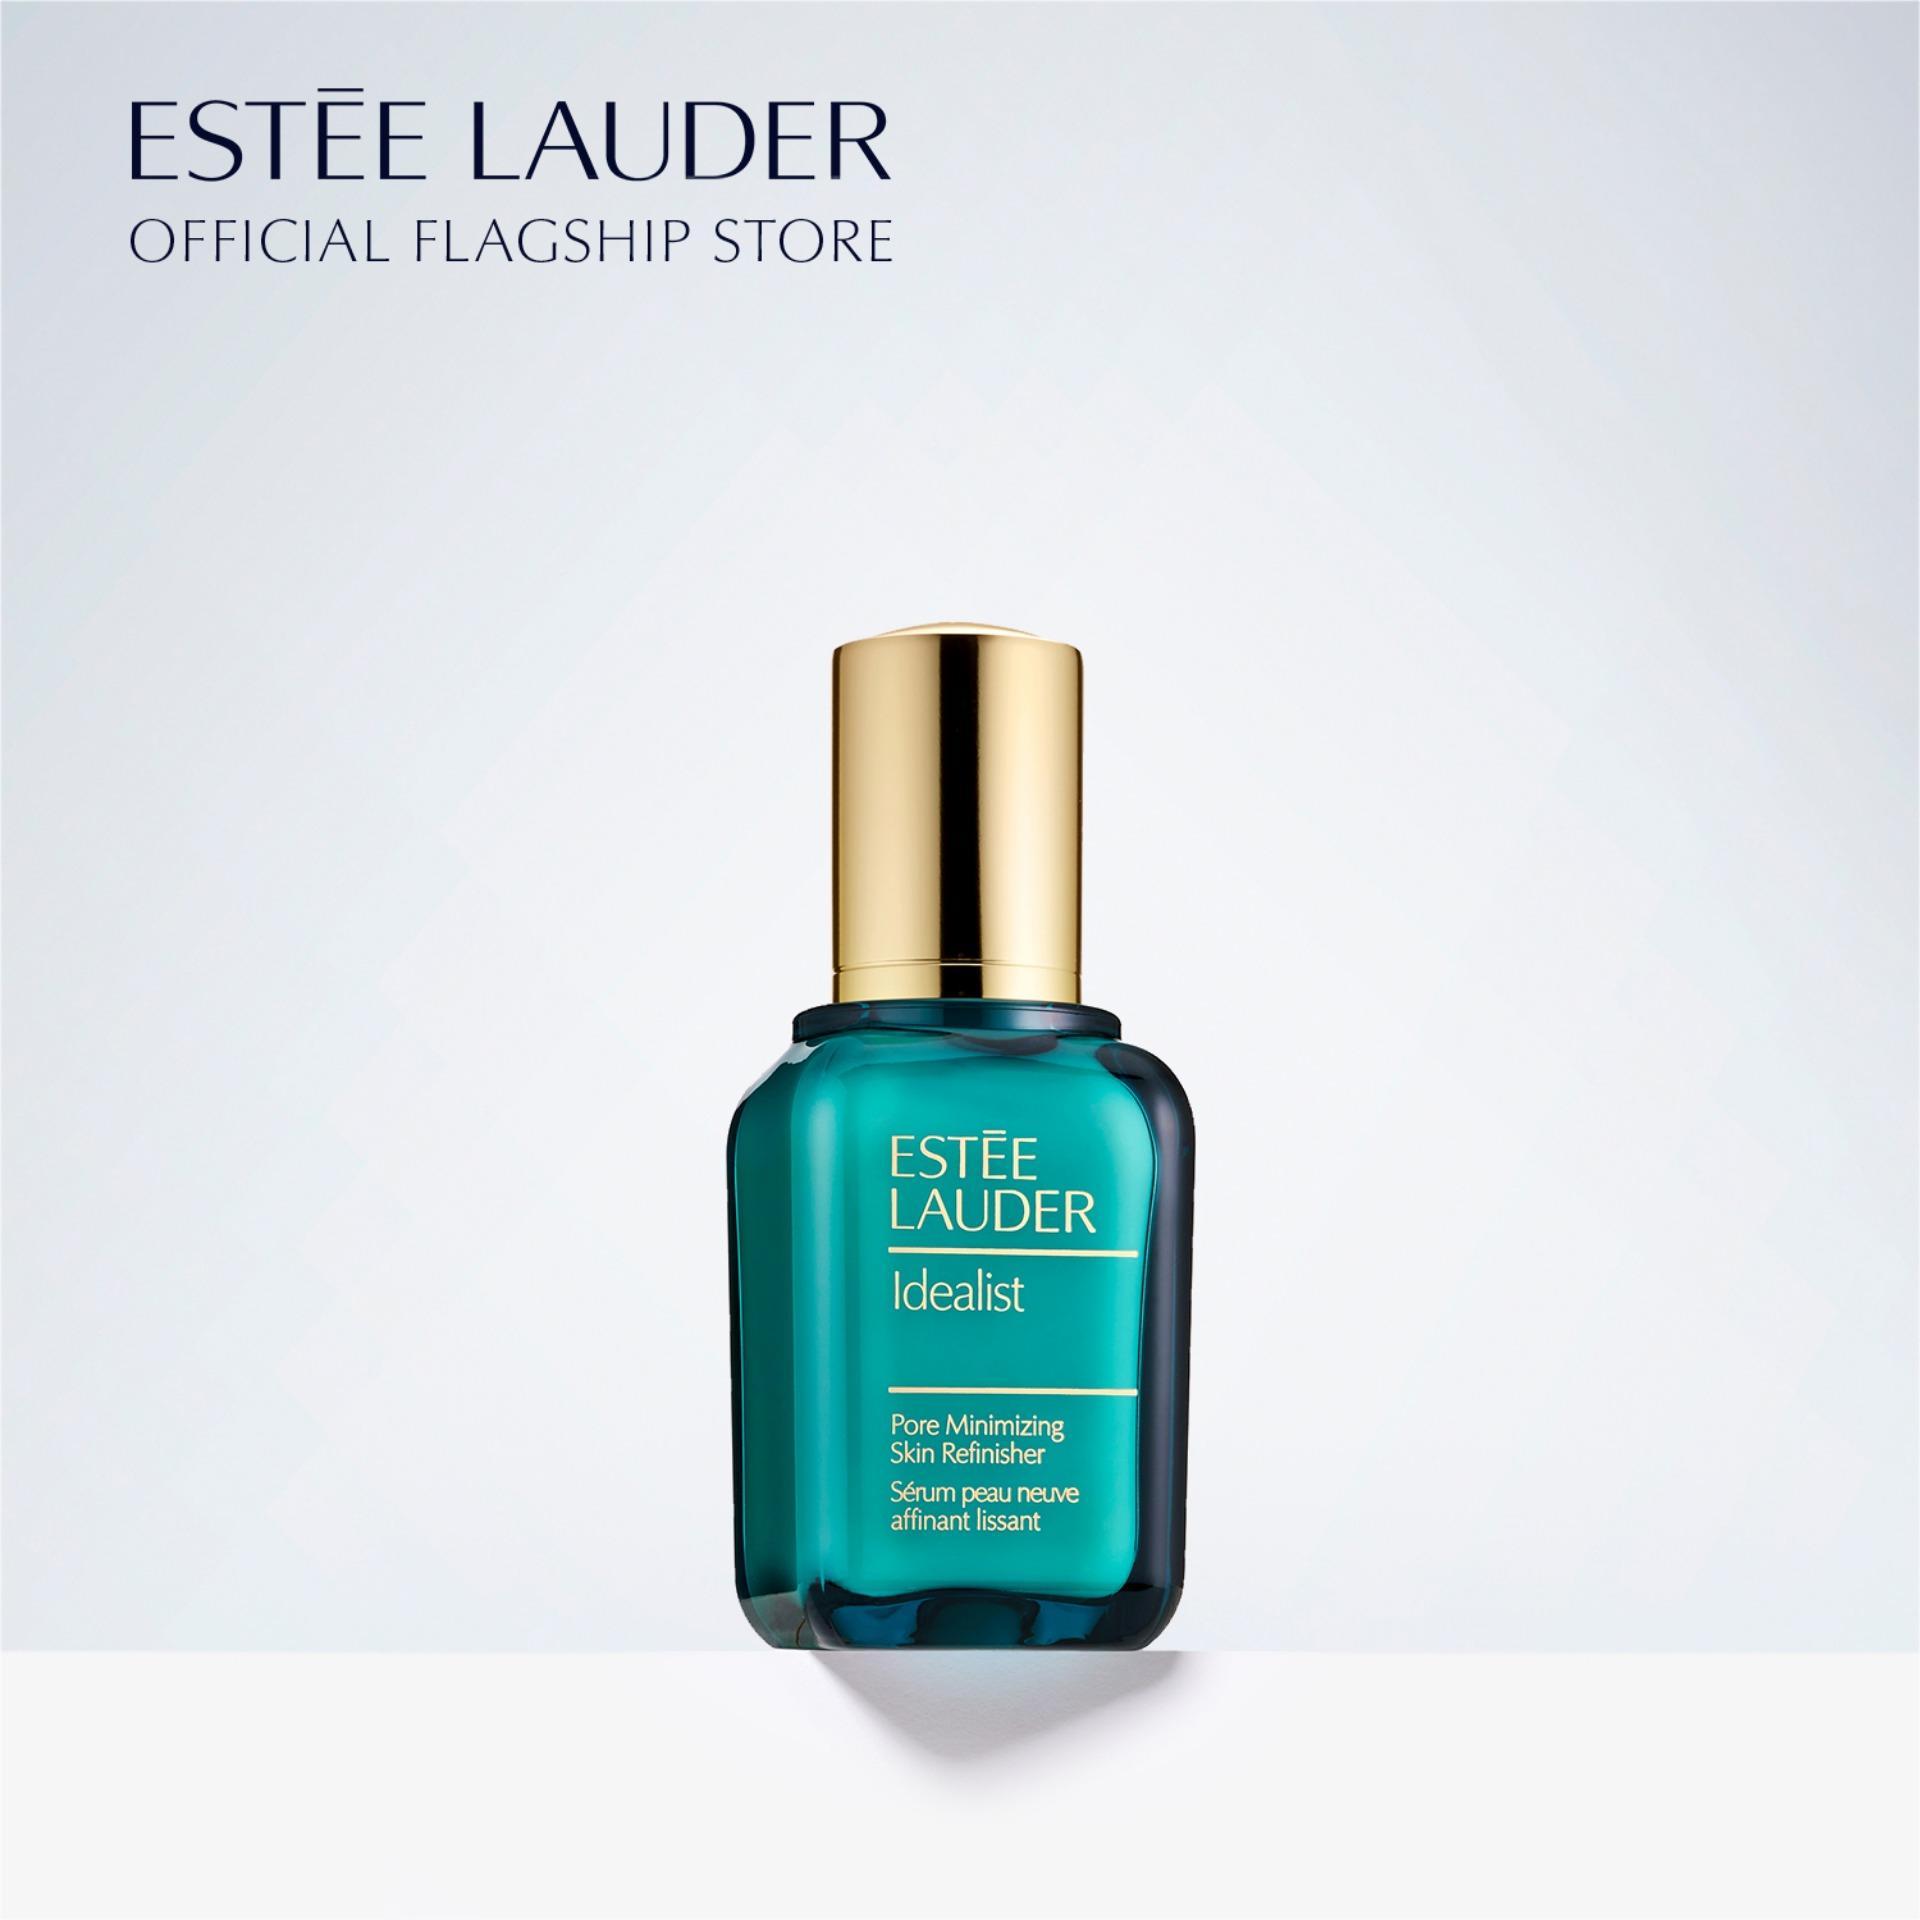 Tinh chất se khít lỗ chân lông Estee Lauder Idealist Pore Minmzer 50ml nhập khẩu